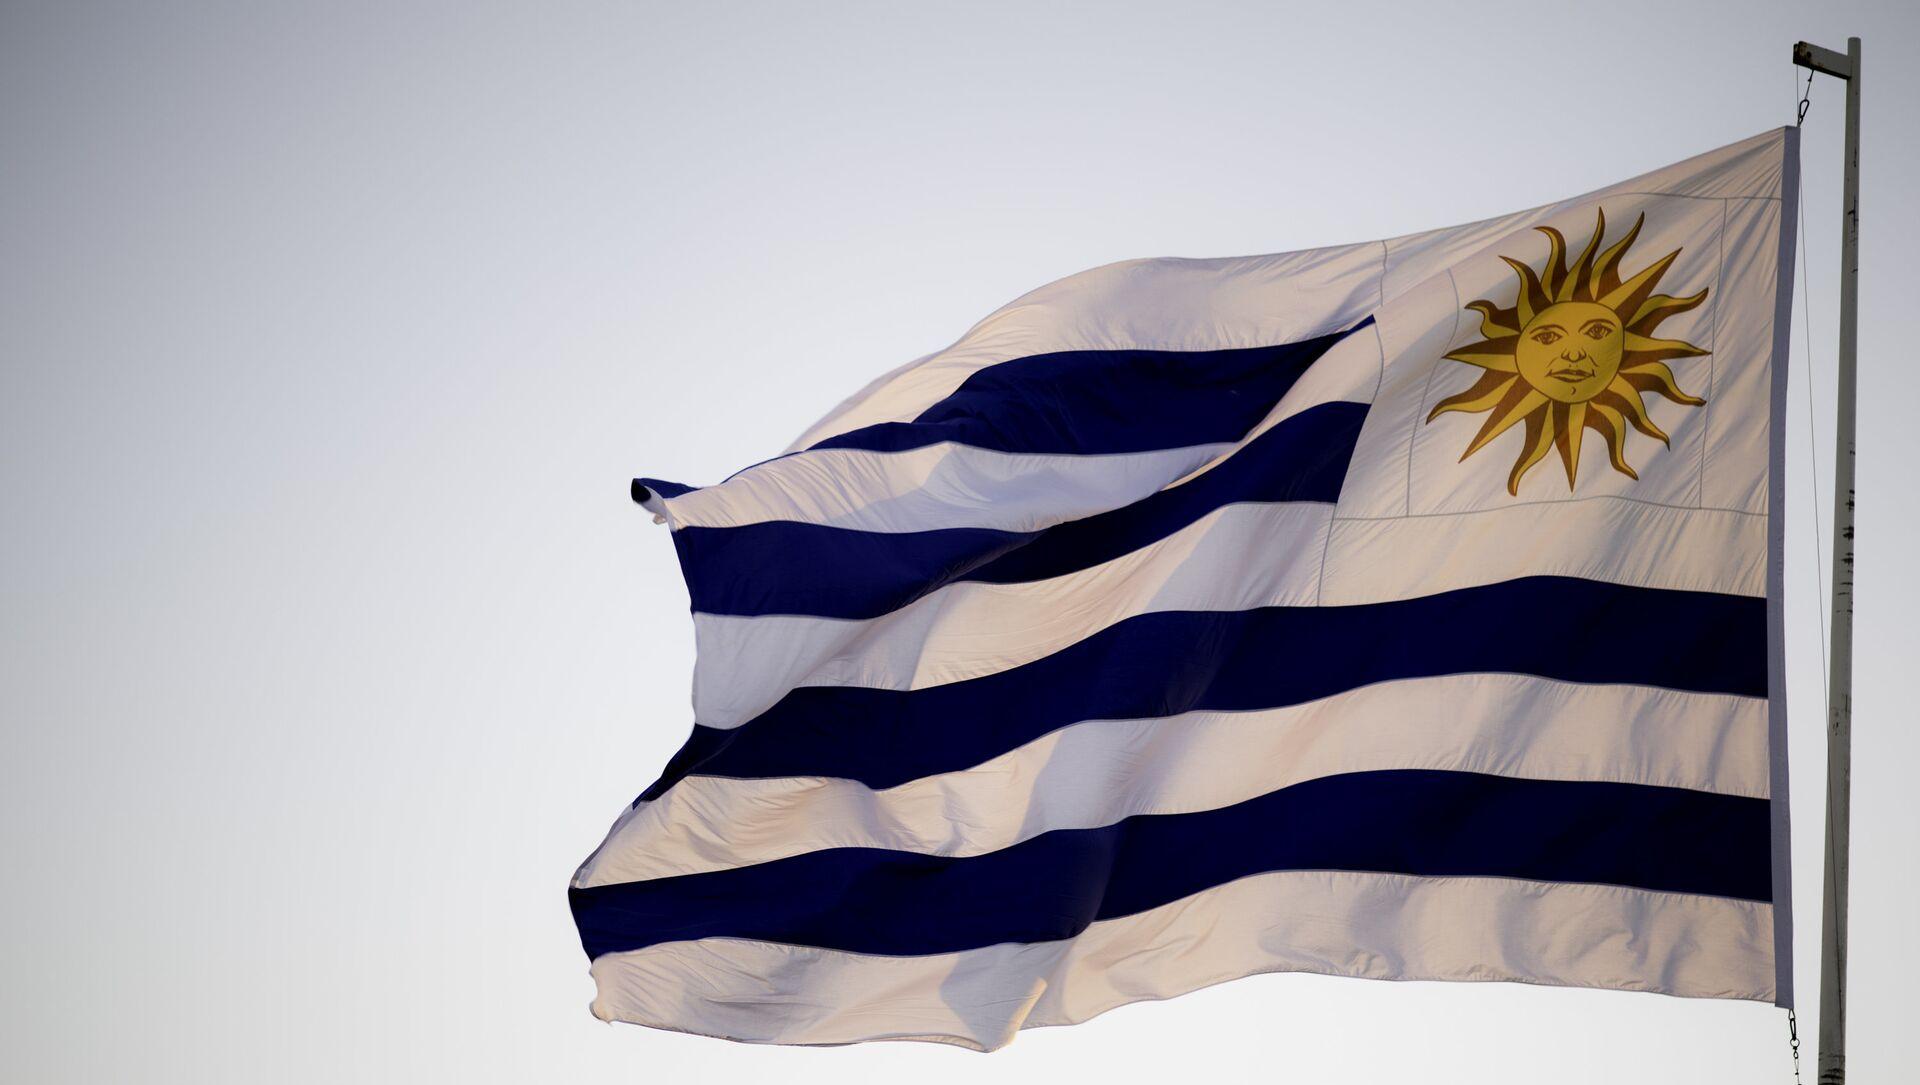 Bandera de Uruguay - Sputnik Mundo, 1920, 30.11.2020